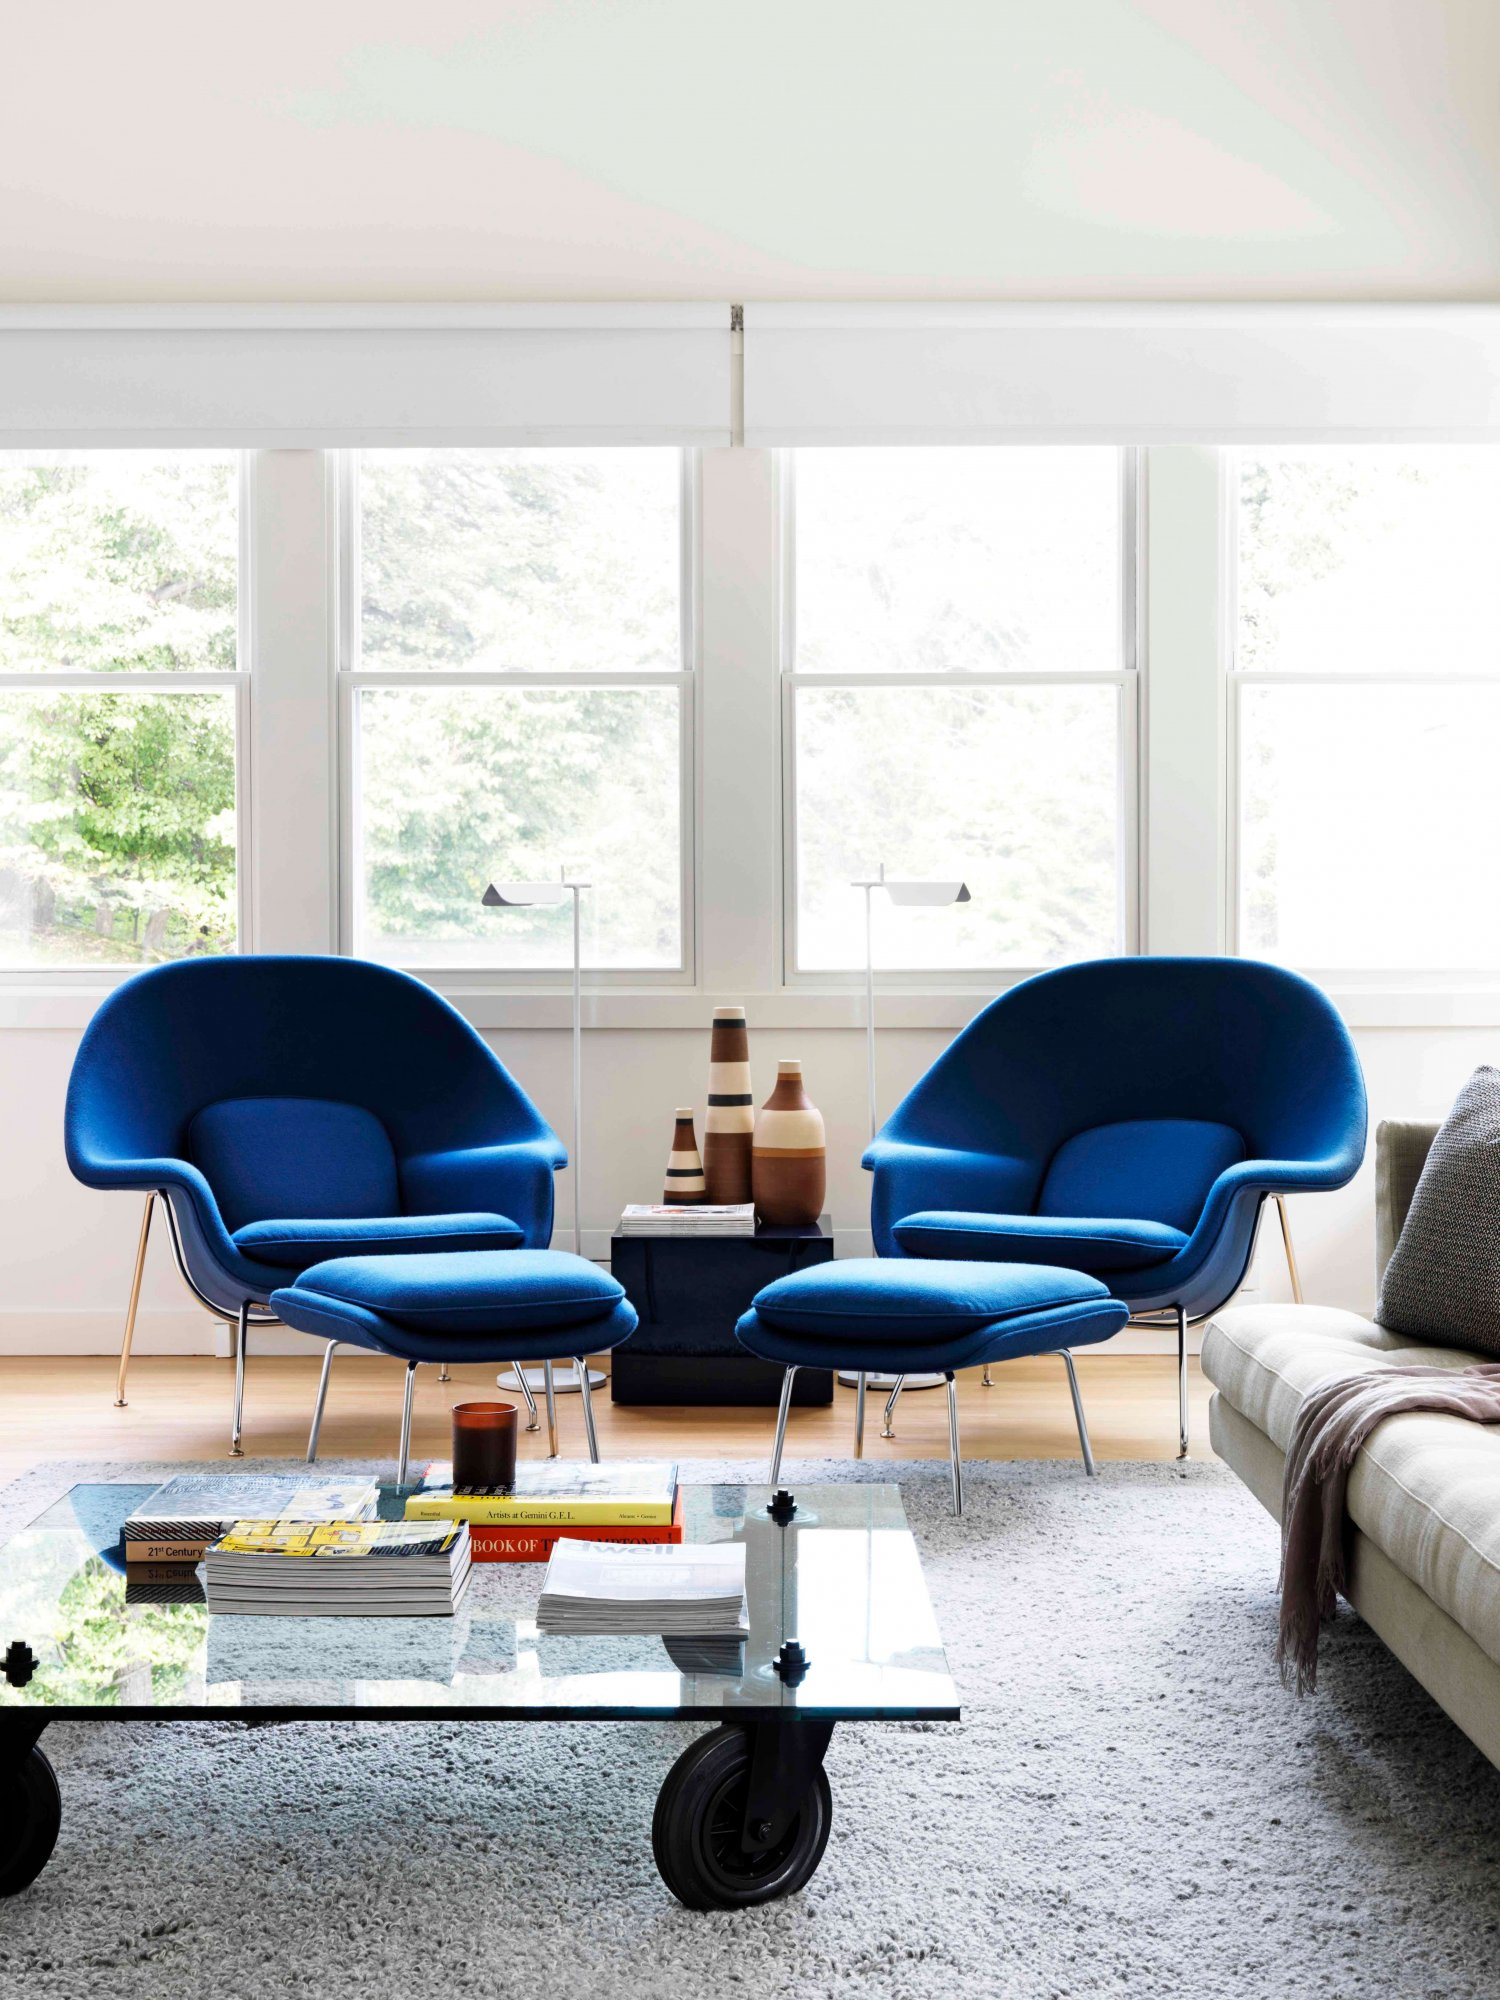 est living Lucy Marcyk Nexus Designs Shelter Island 1 e1520559039974